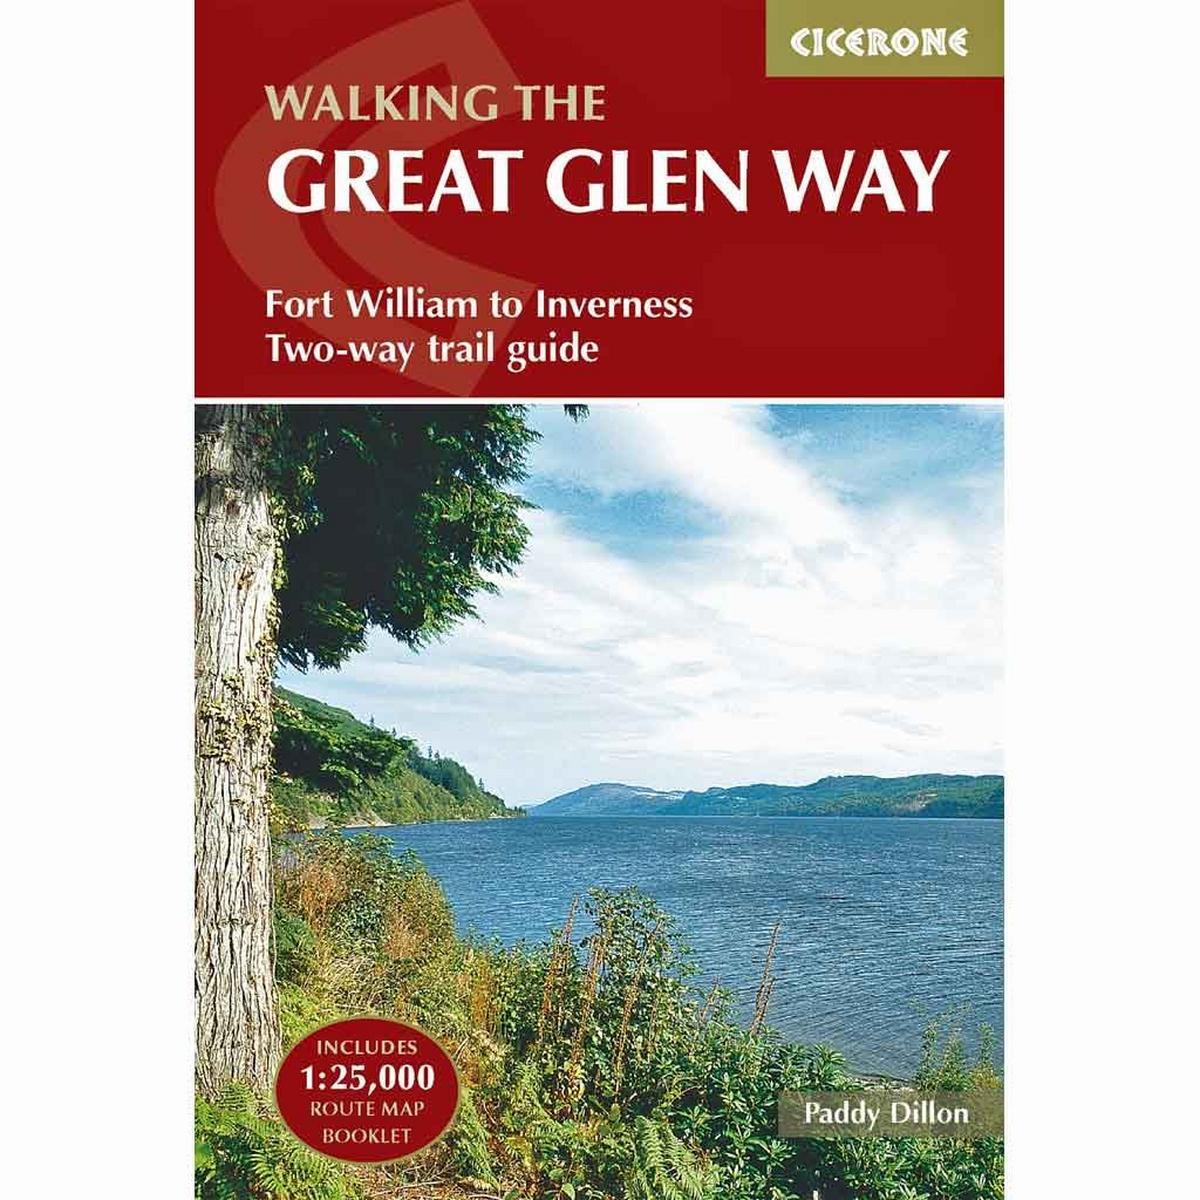 Cicerone Walking Guide Book: The Great Glen Way